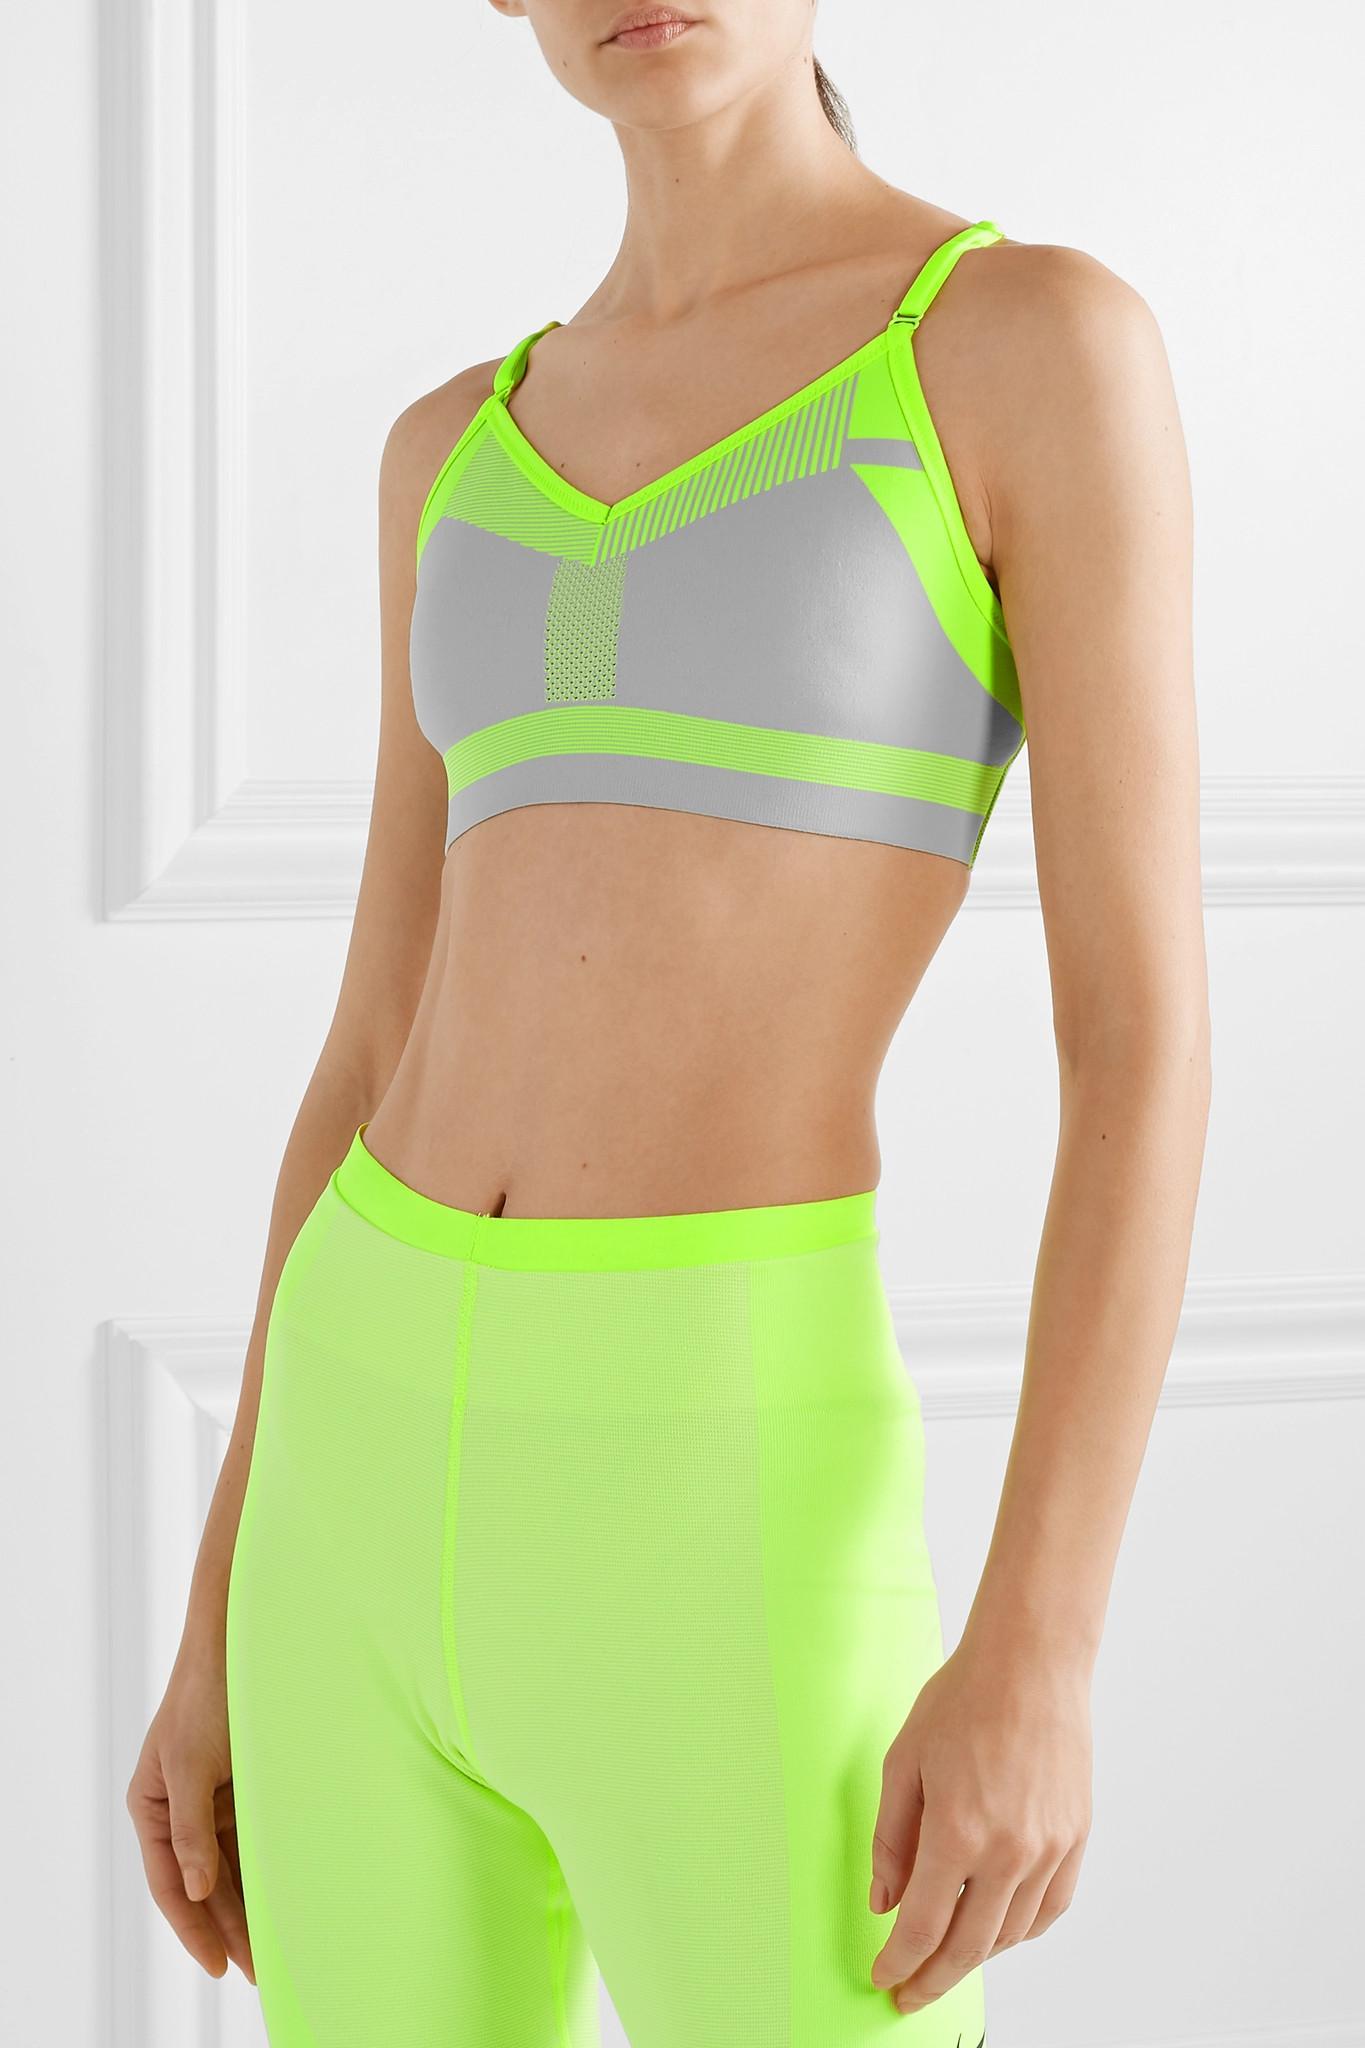 afaefb2cc5a79 Nike - Green Indy Neon Flyknit Sports Bra - Lyst. View fullscreen